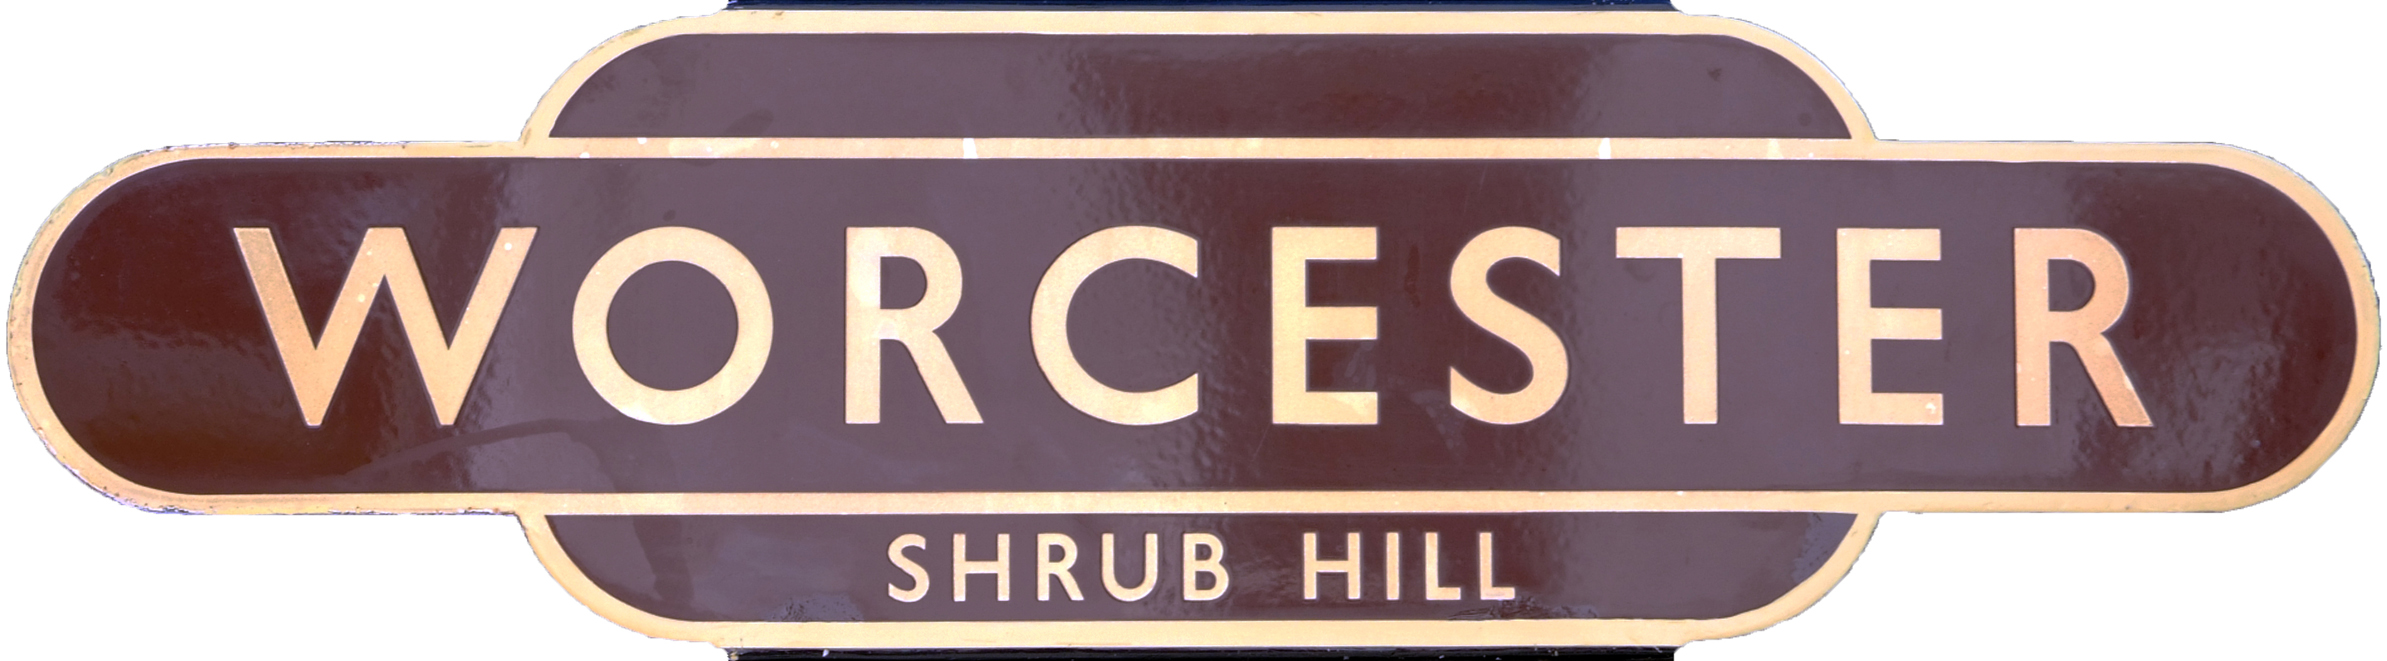 Totem, BR(W) WORCESTER SHRUB HILL, H/F. Ex Oxford